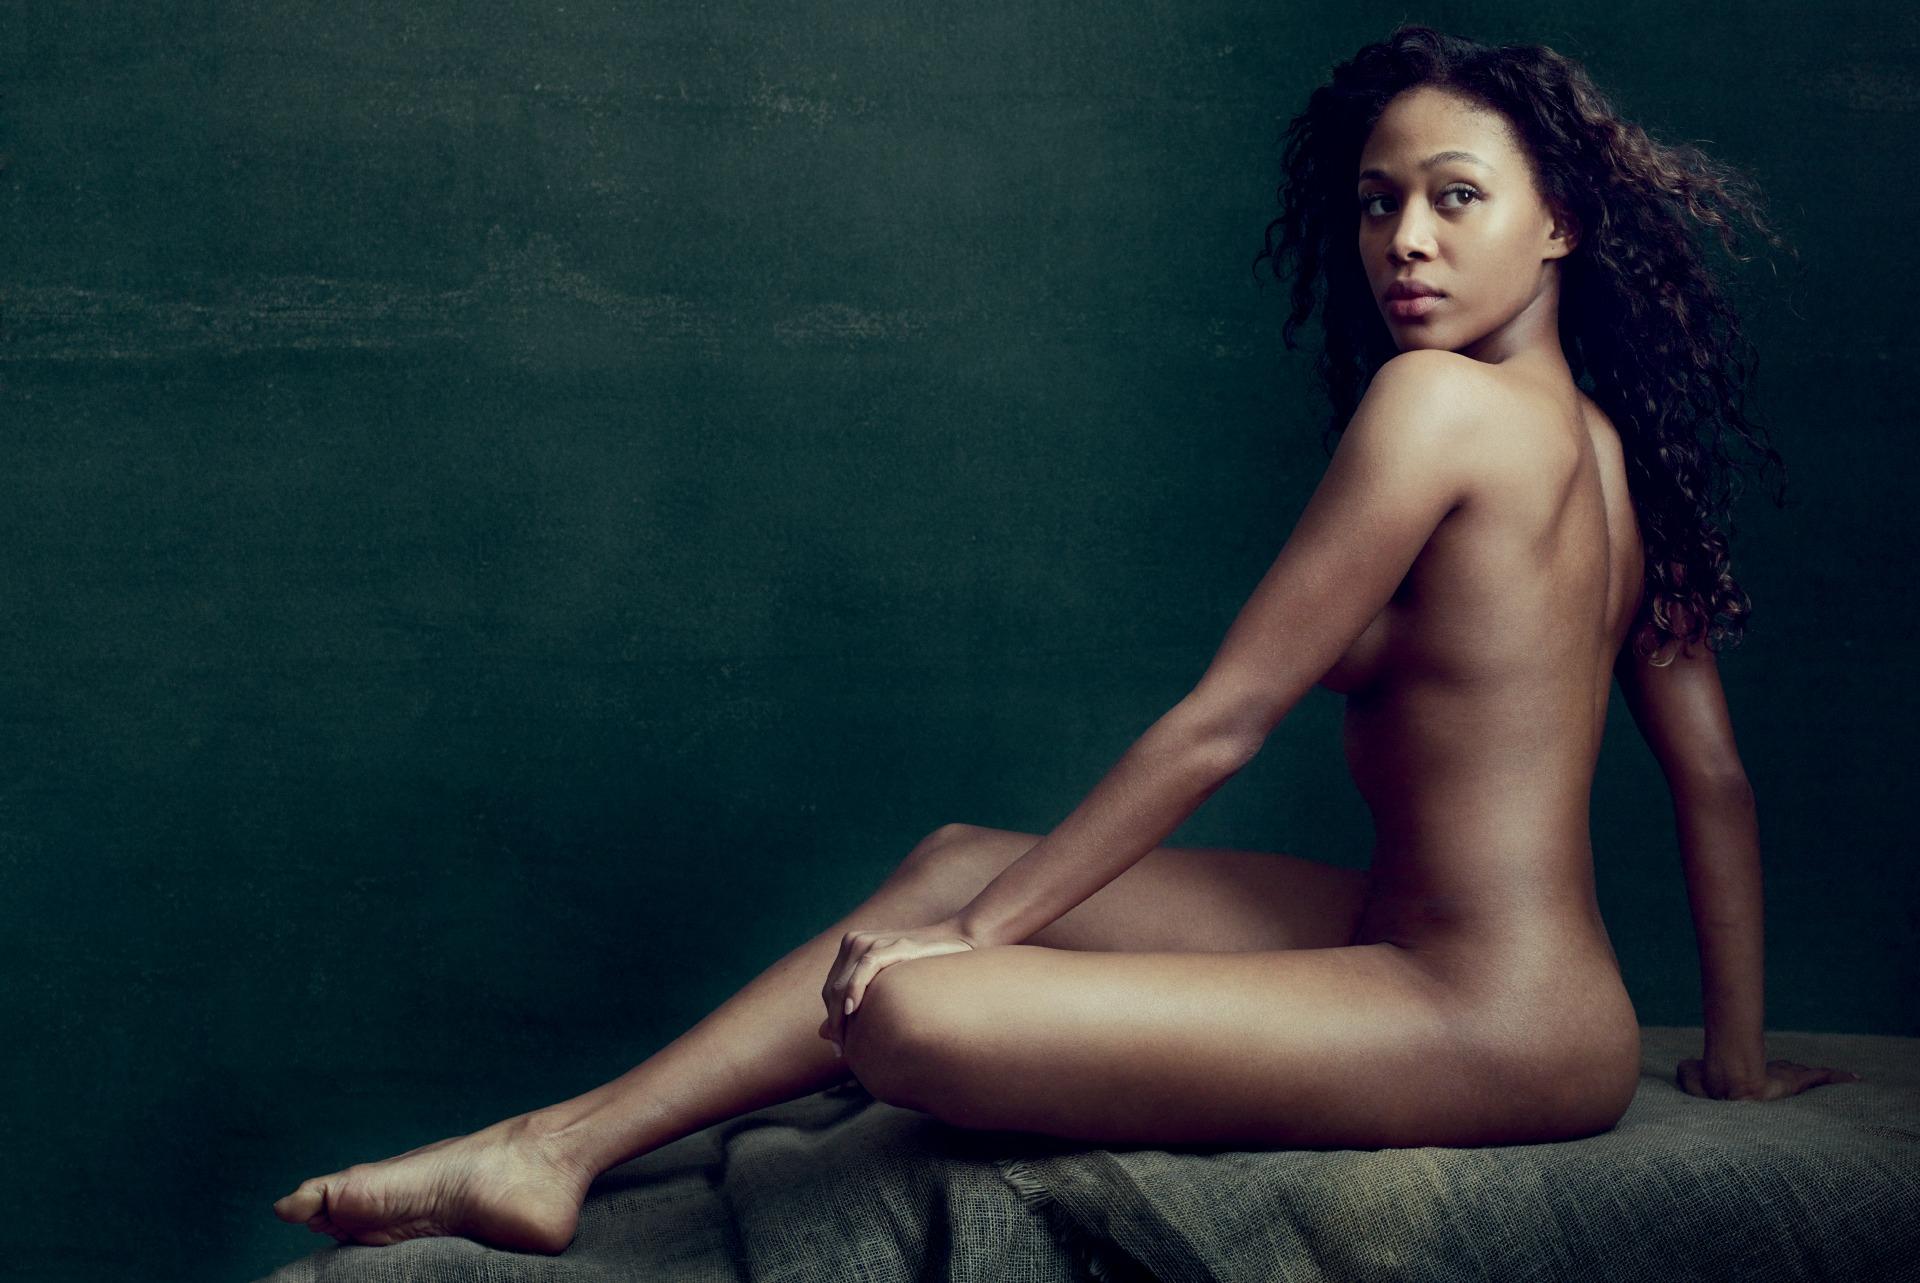 Nicole Beharie nude for Allure magazine